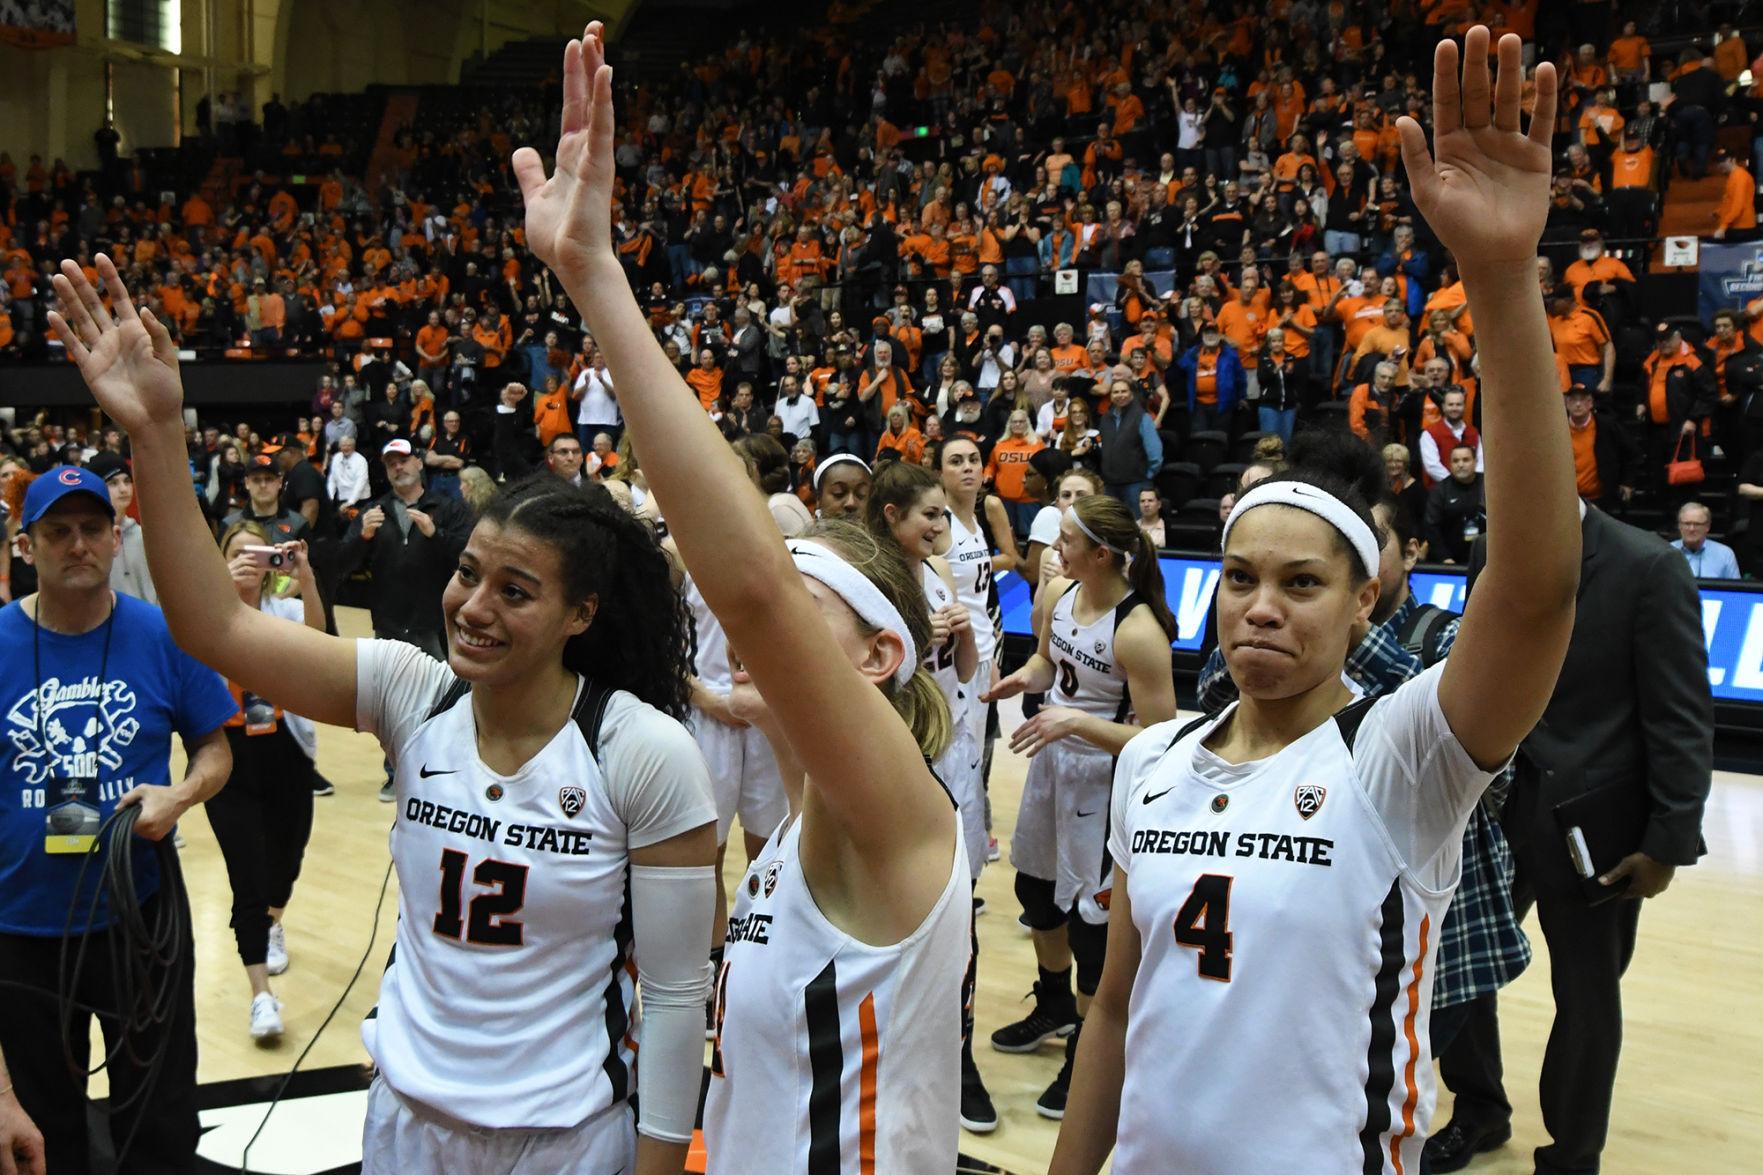 Oregon State advances to Stockton with easy win